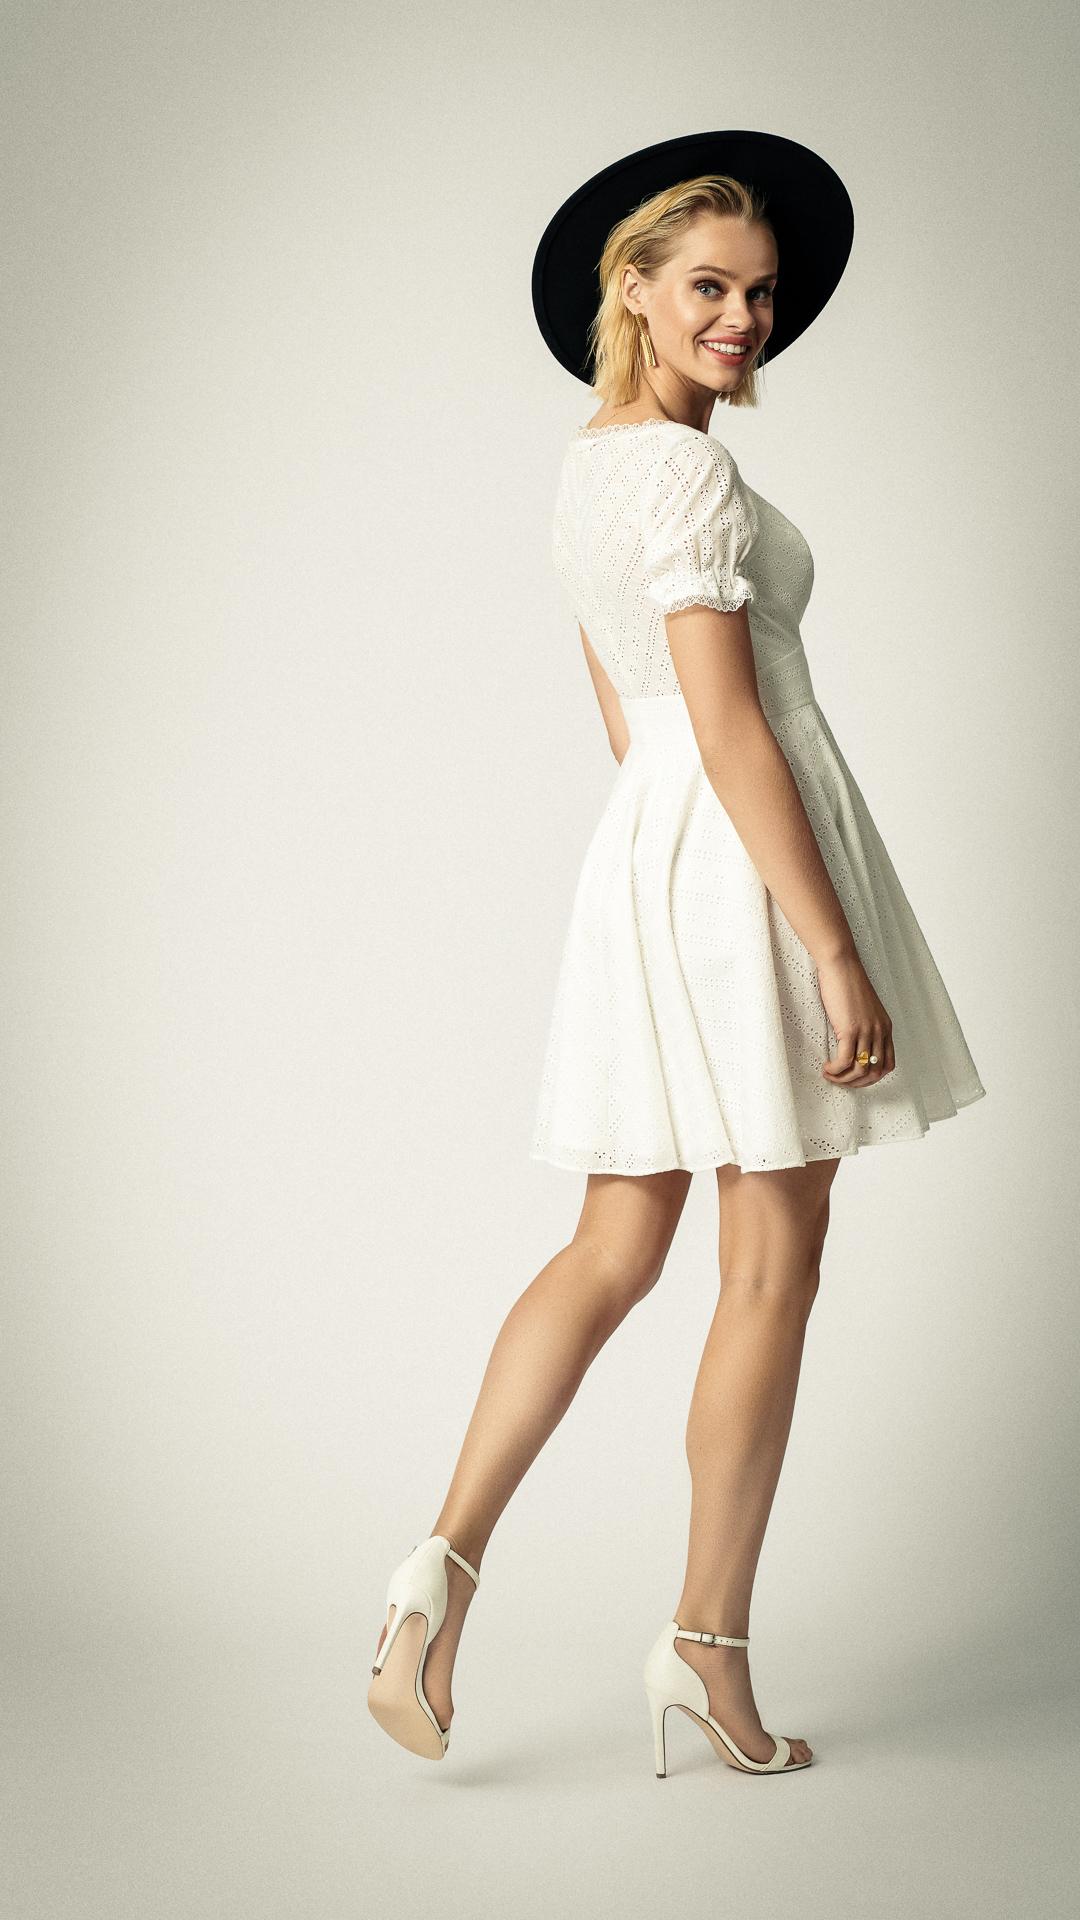 Rembo-Styling-2020-Pretty-little-dress-2-hr